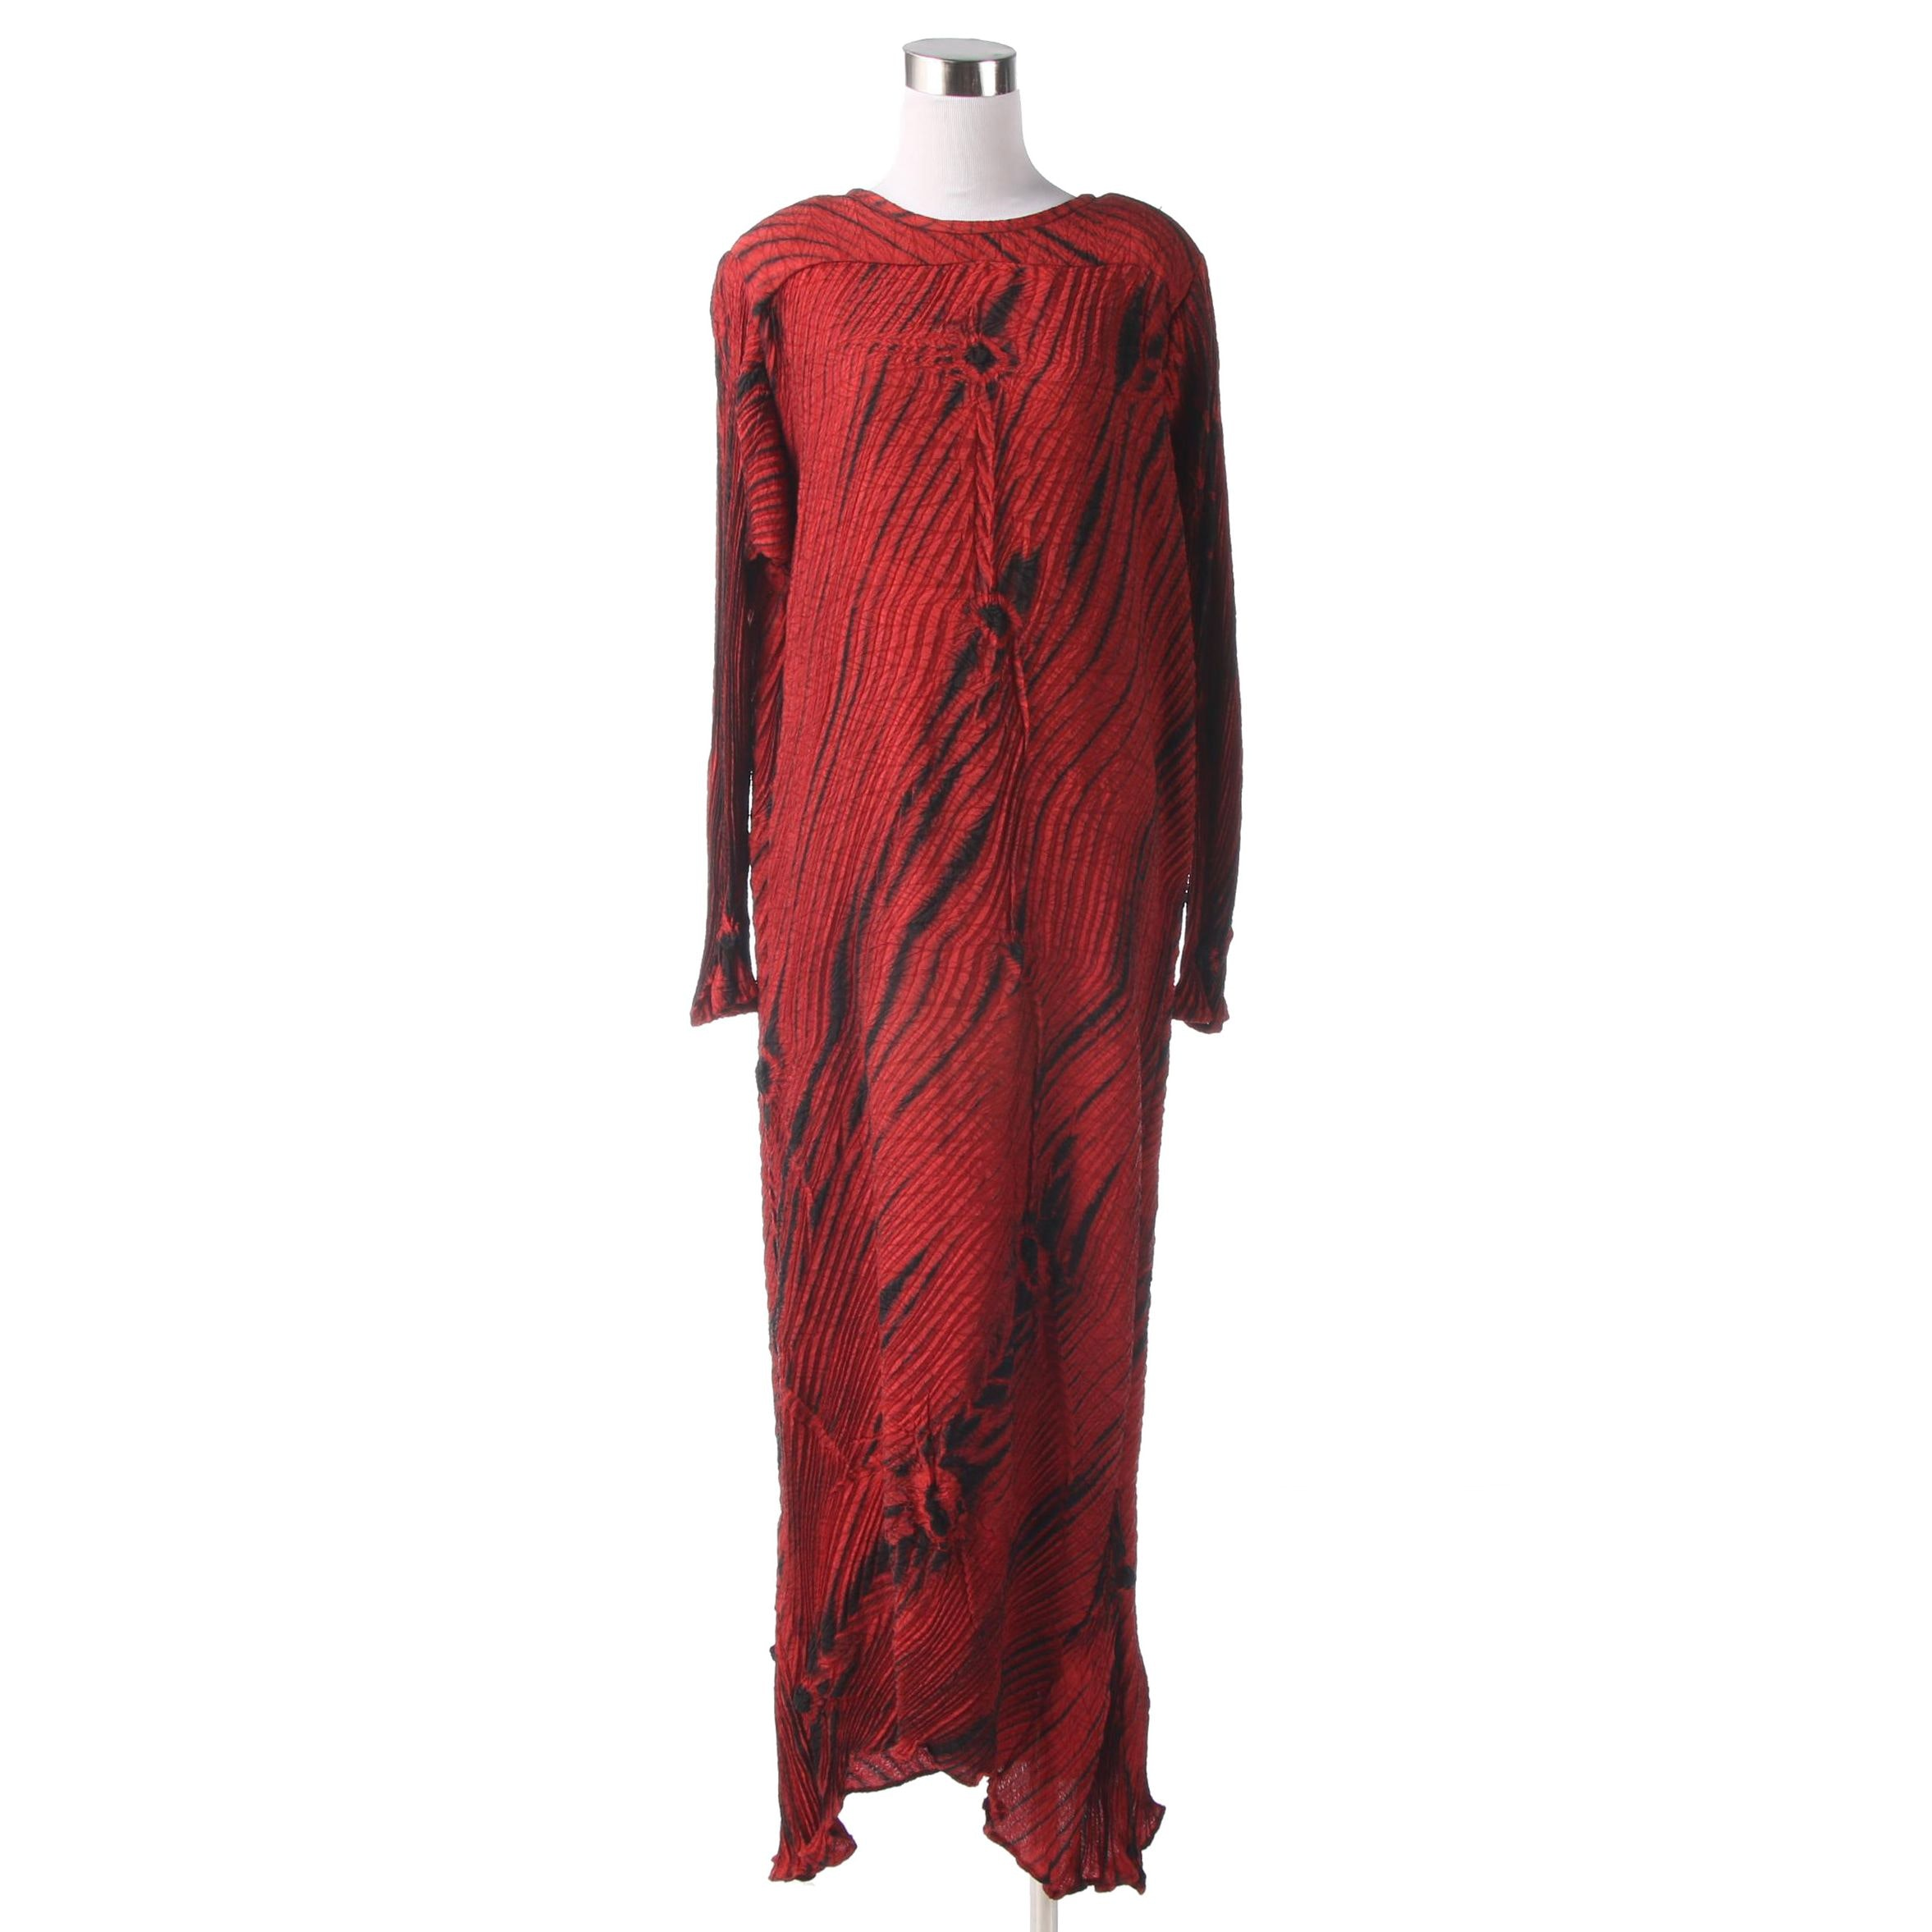 Joan McGee Shibori Dyed Red and Black Silk Evening Dress